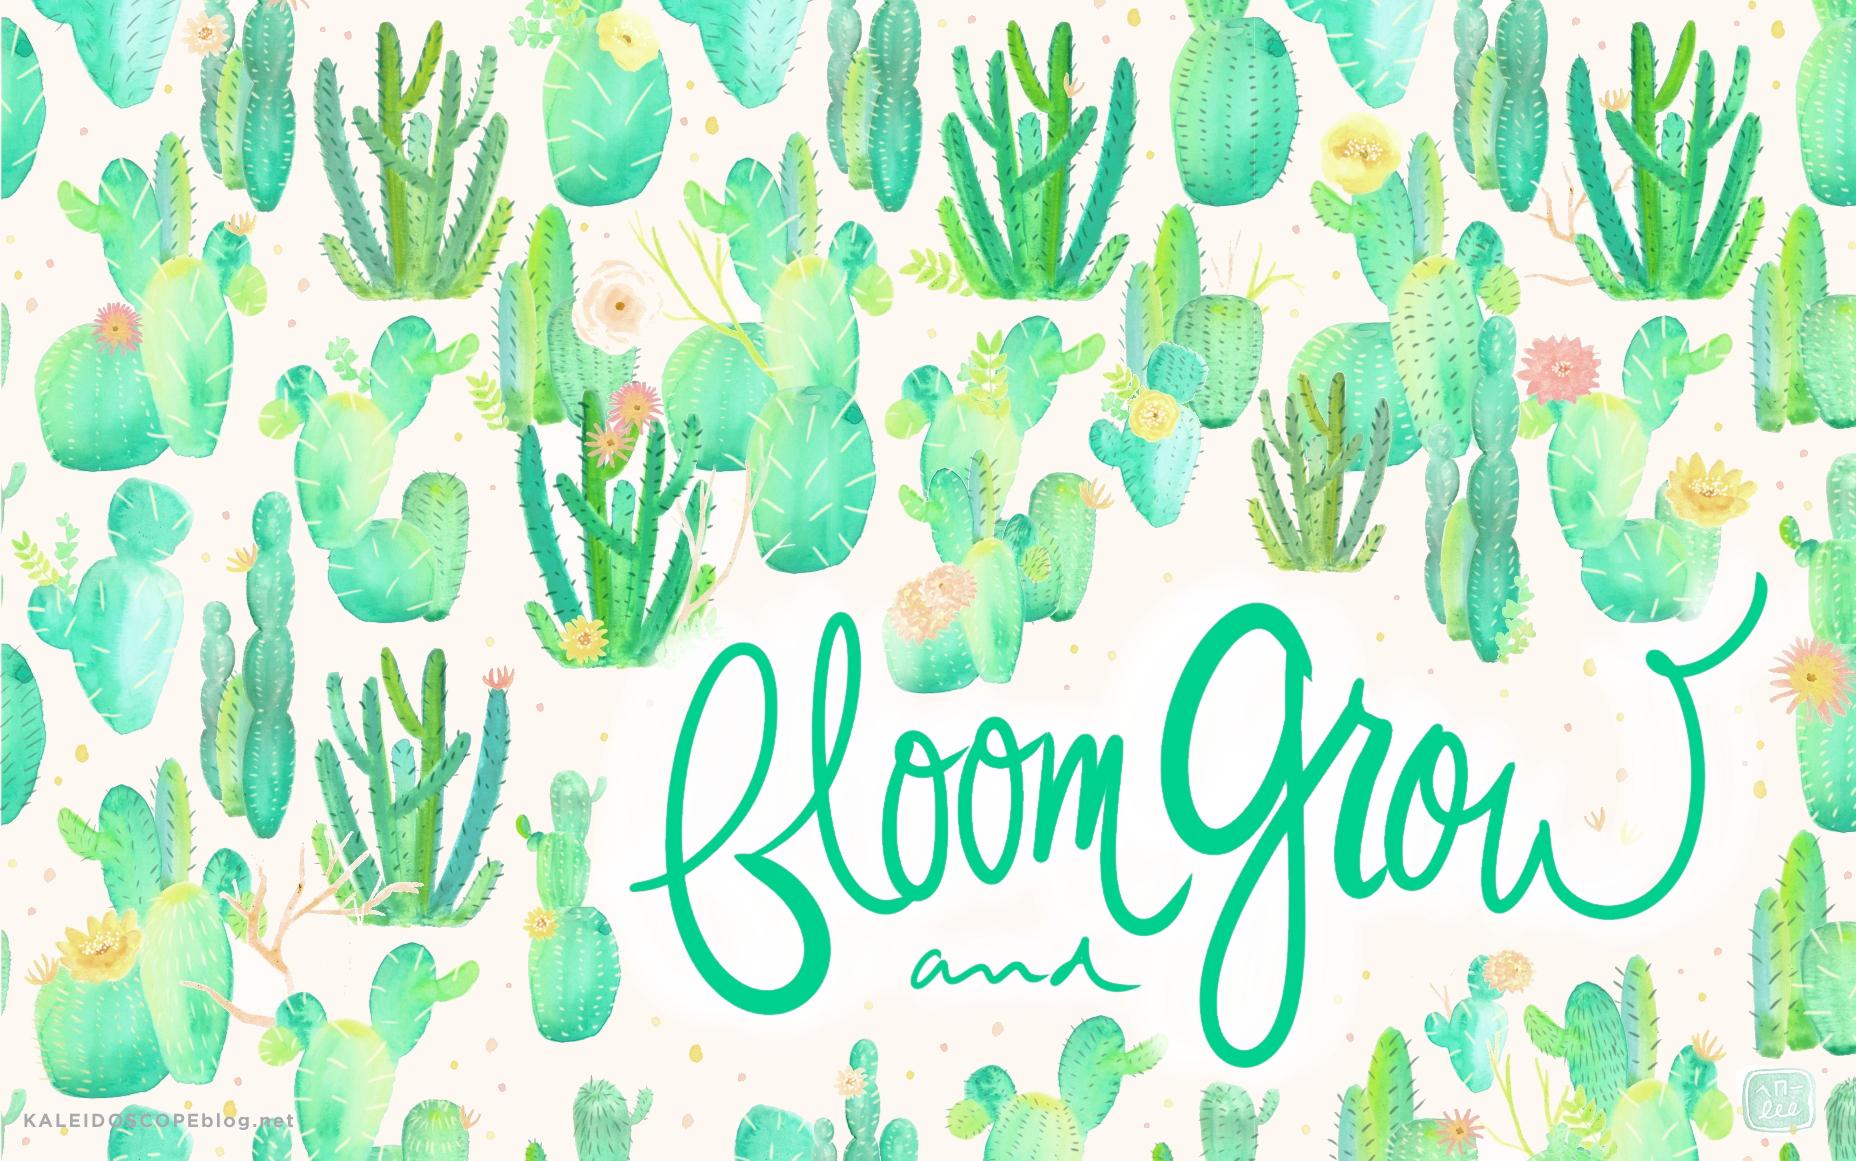 Kaleidoscope-Glorious-Mess-Desktop-Wallpaper-June-2015